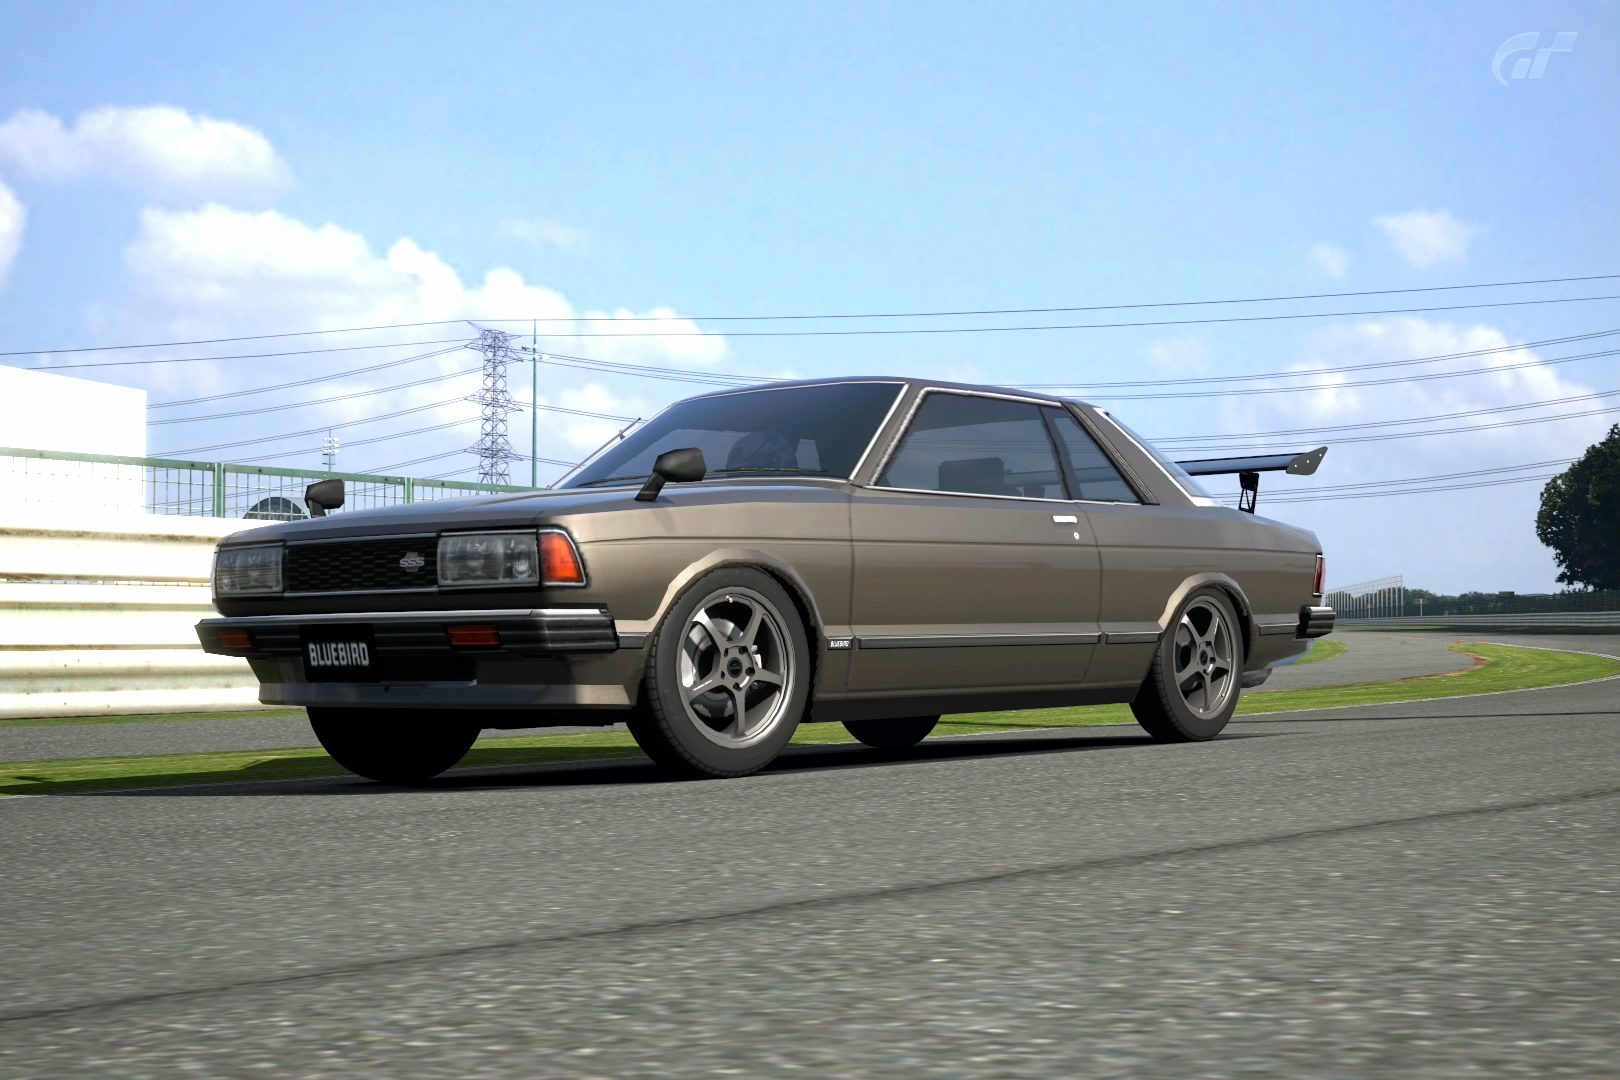 Pathfinder Turbo >> Nissan Bluebird 910 - More information